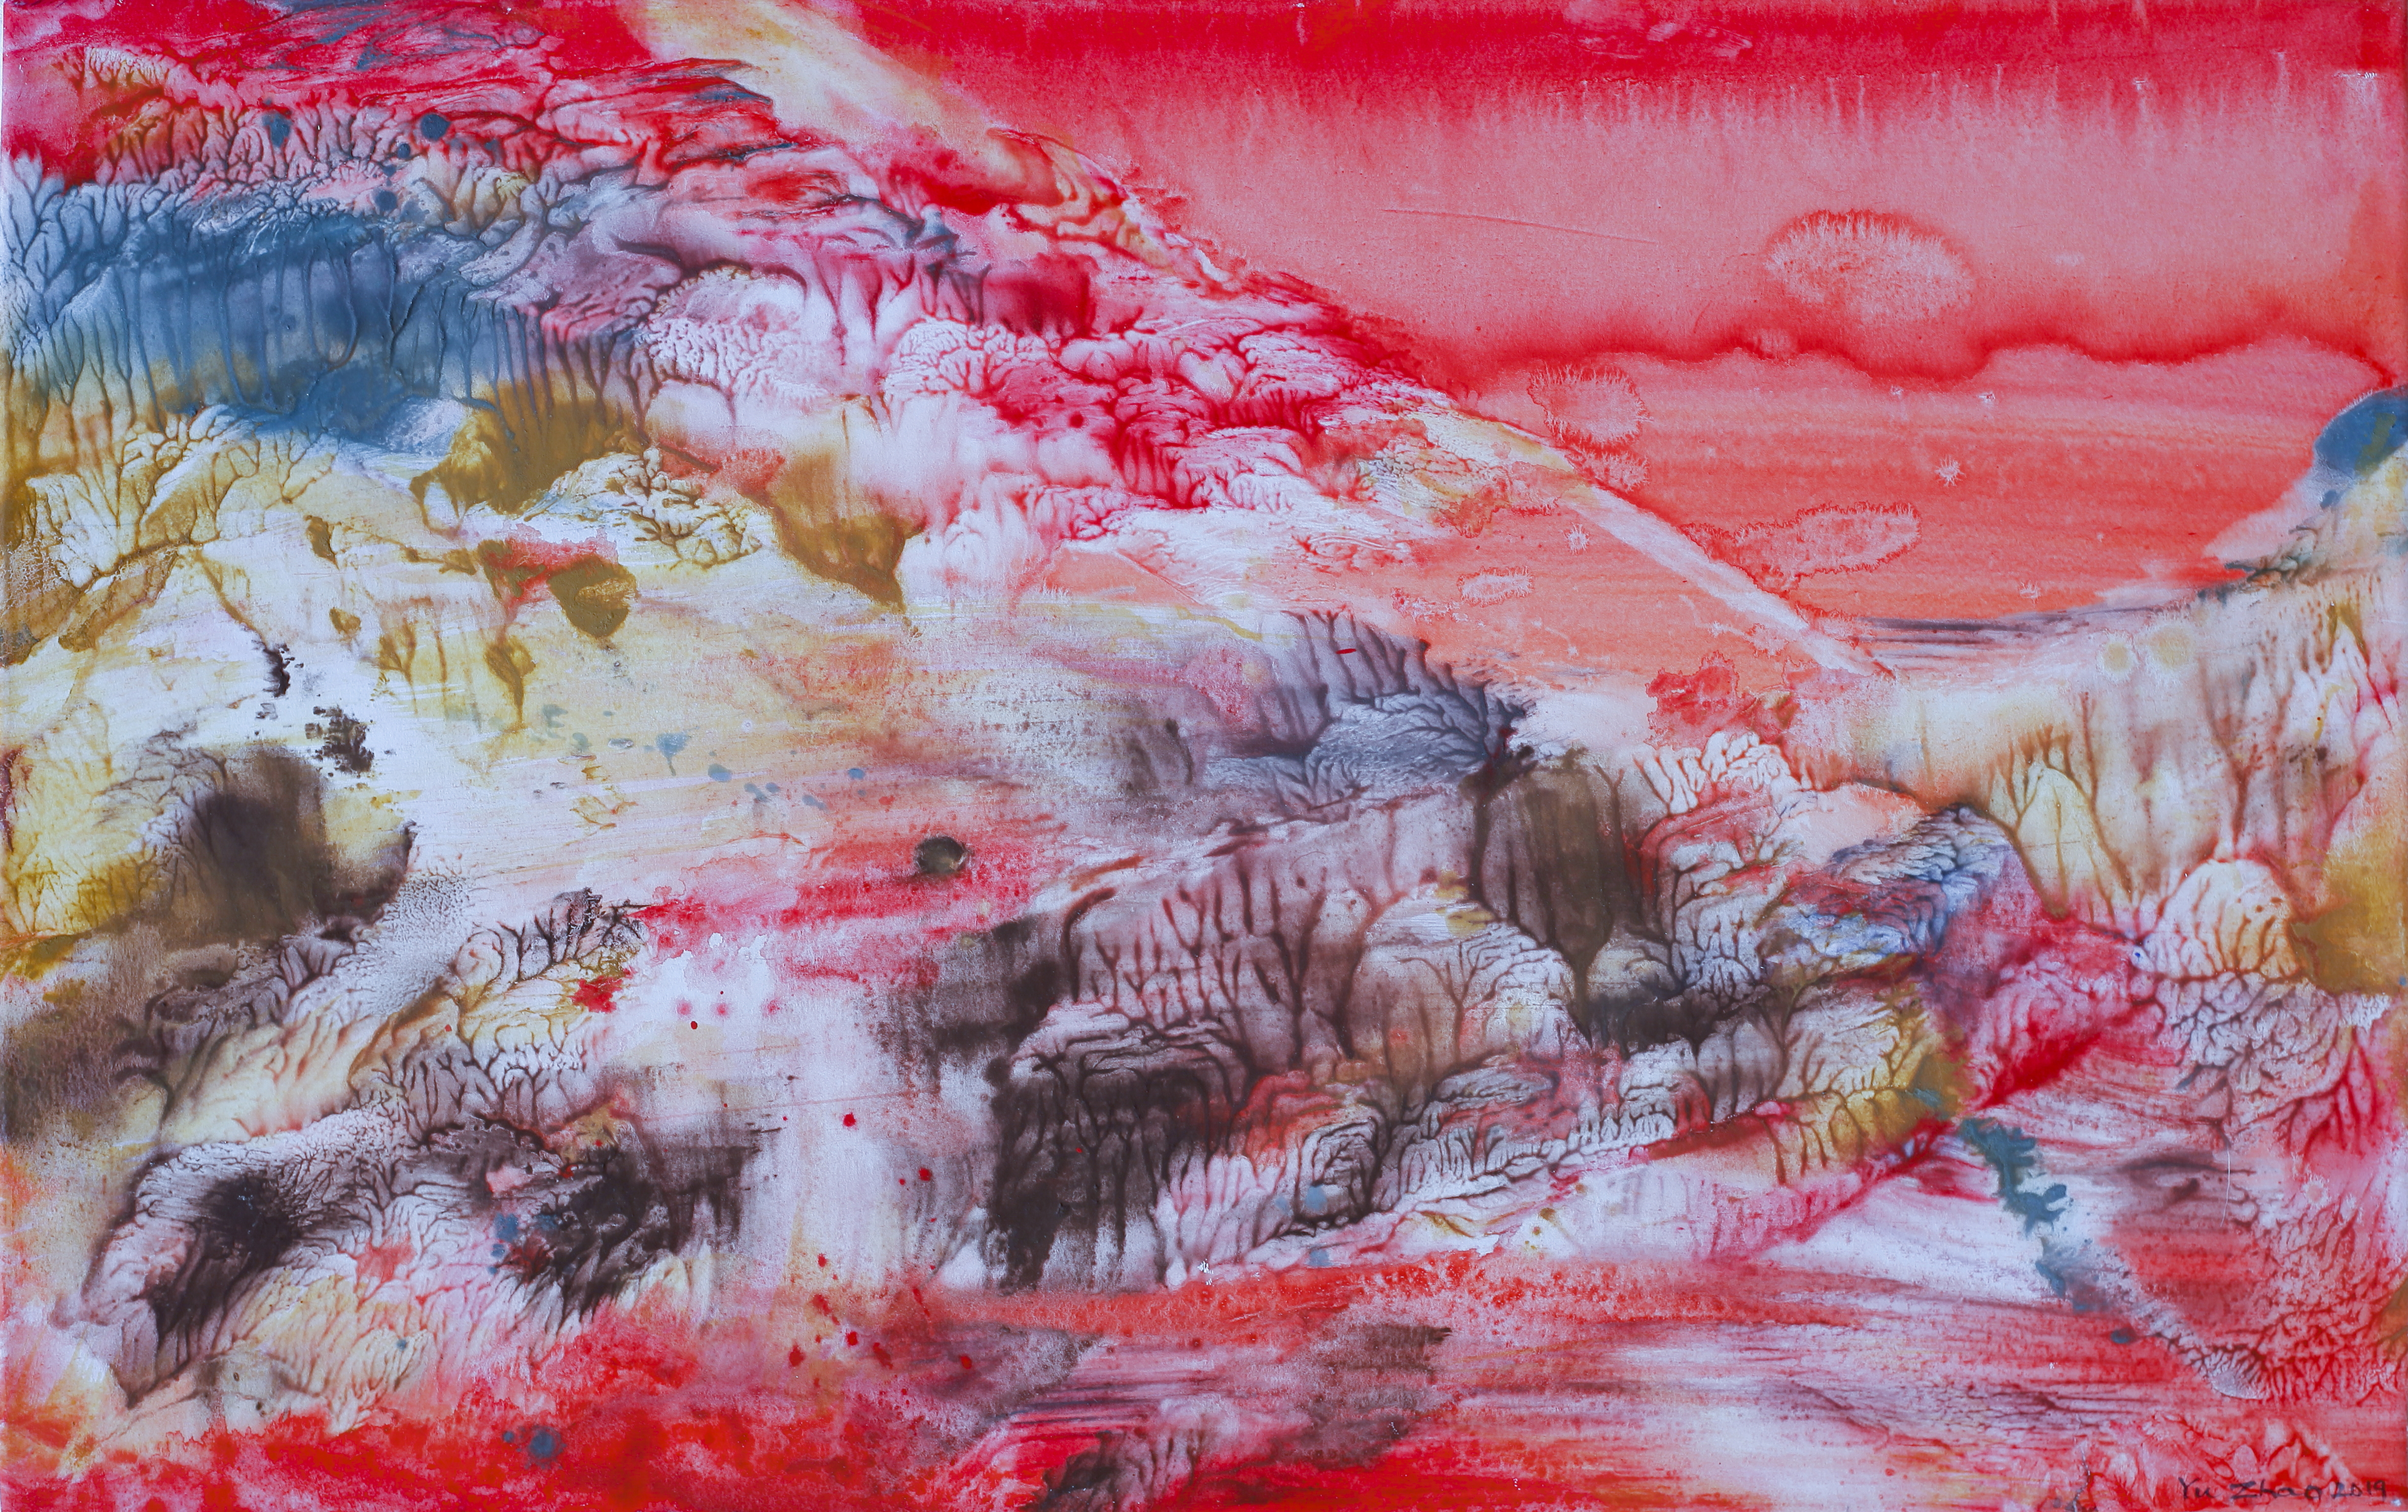 Yu Zhao, Village in peach flowers, tempera/paper/canvas, 35x20cm, 2019